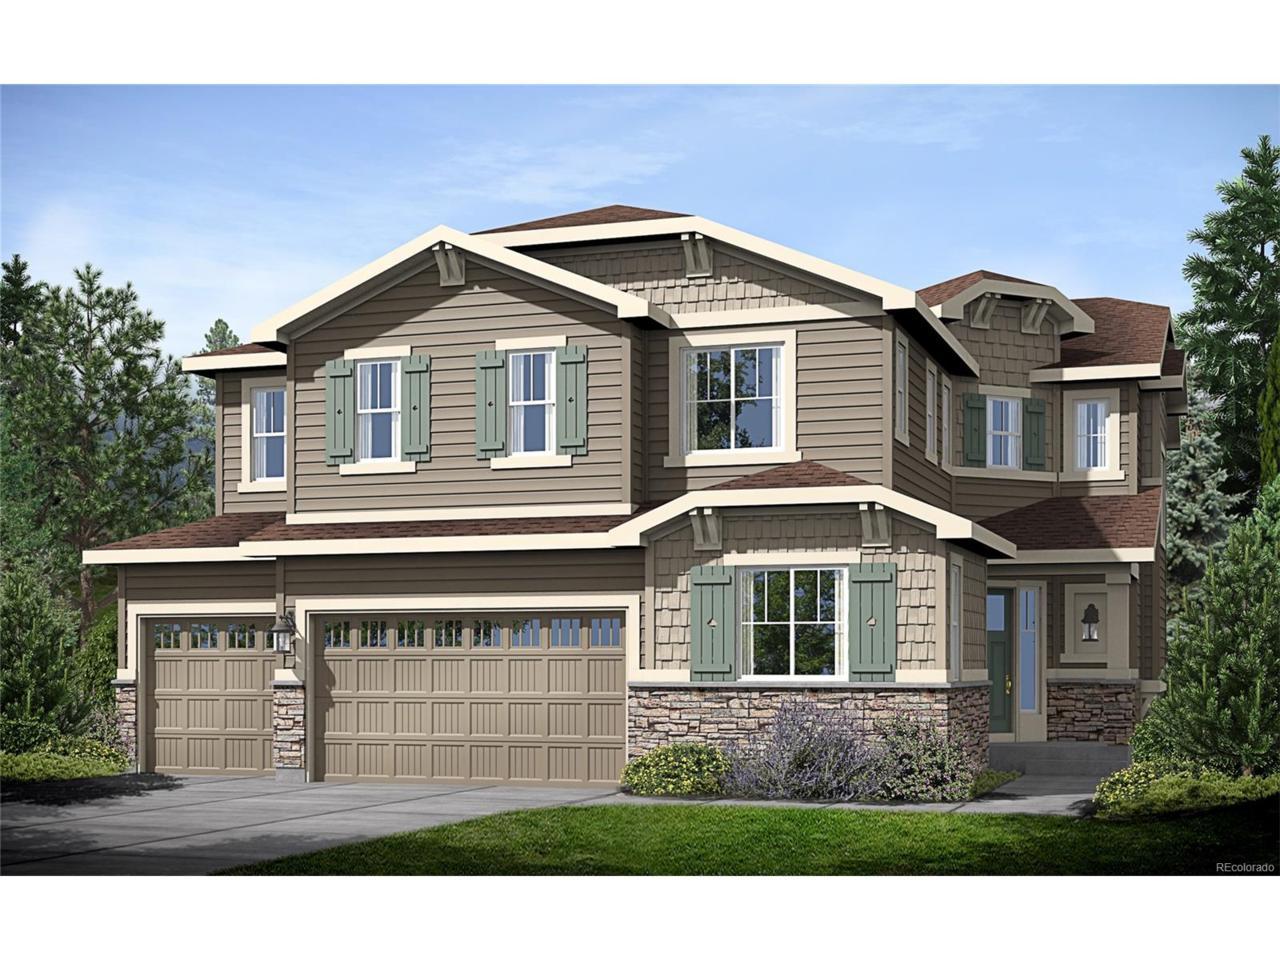 11843 Crofton Drive, Parker, CO 80134 (MLS #3398671) :: 8z Real Estate